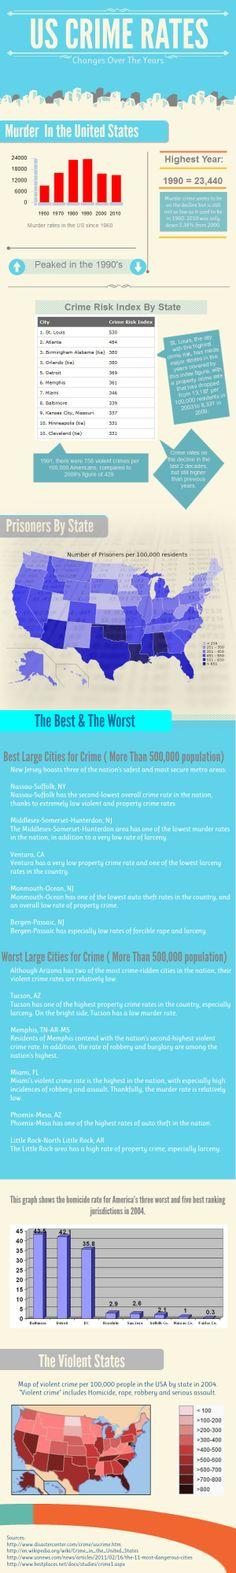 Crime Rate Data: mikerothman.com